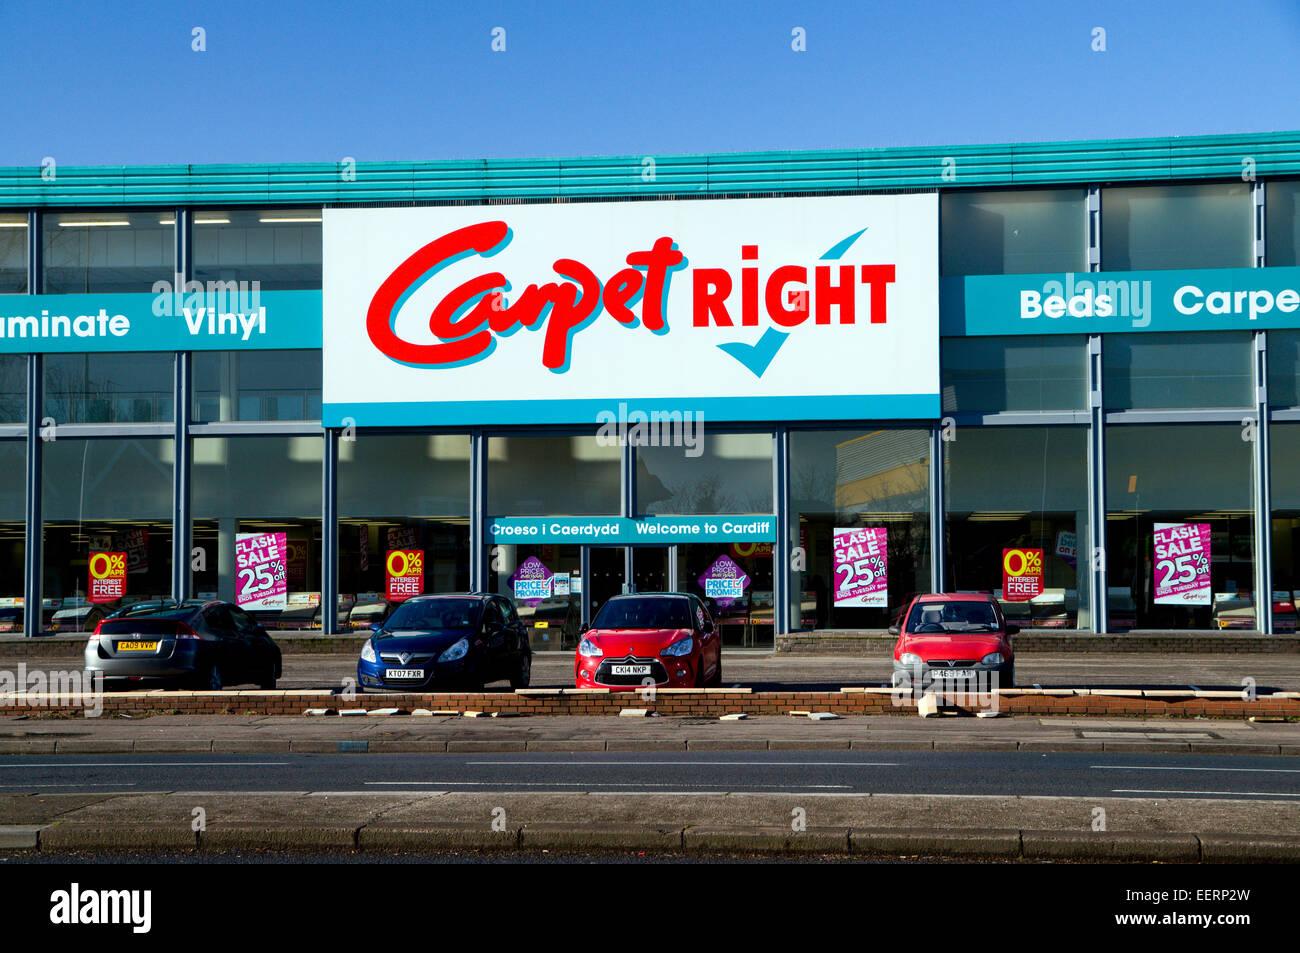 Cardiff Road Newport Stock Photos & Cardiff Road Newport